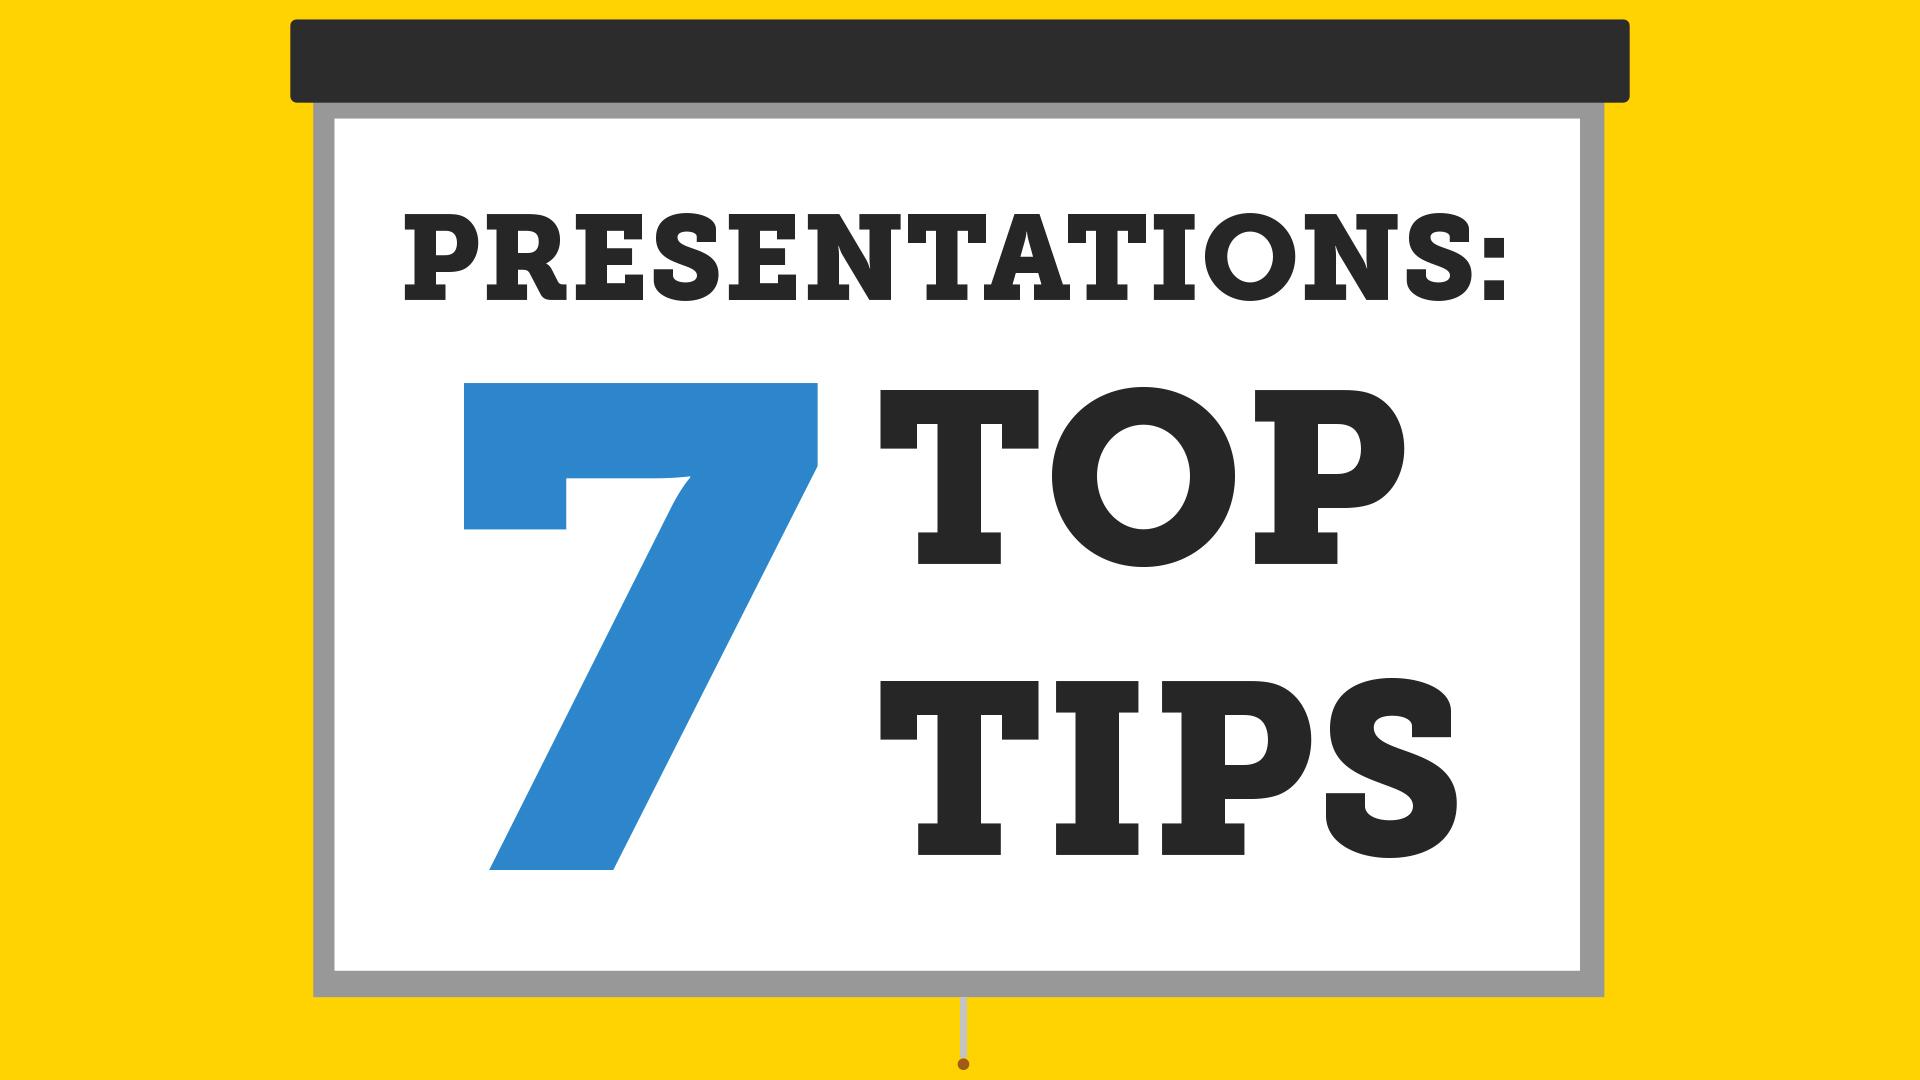 Video: 7 top presentation tips